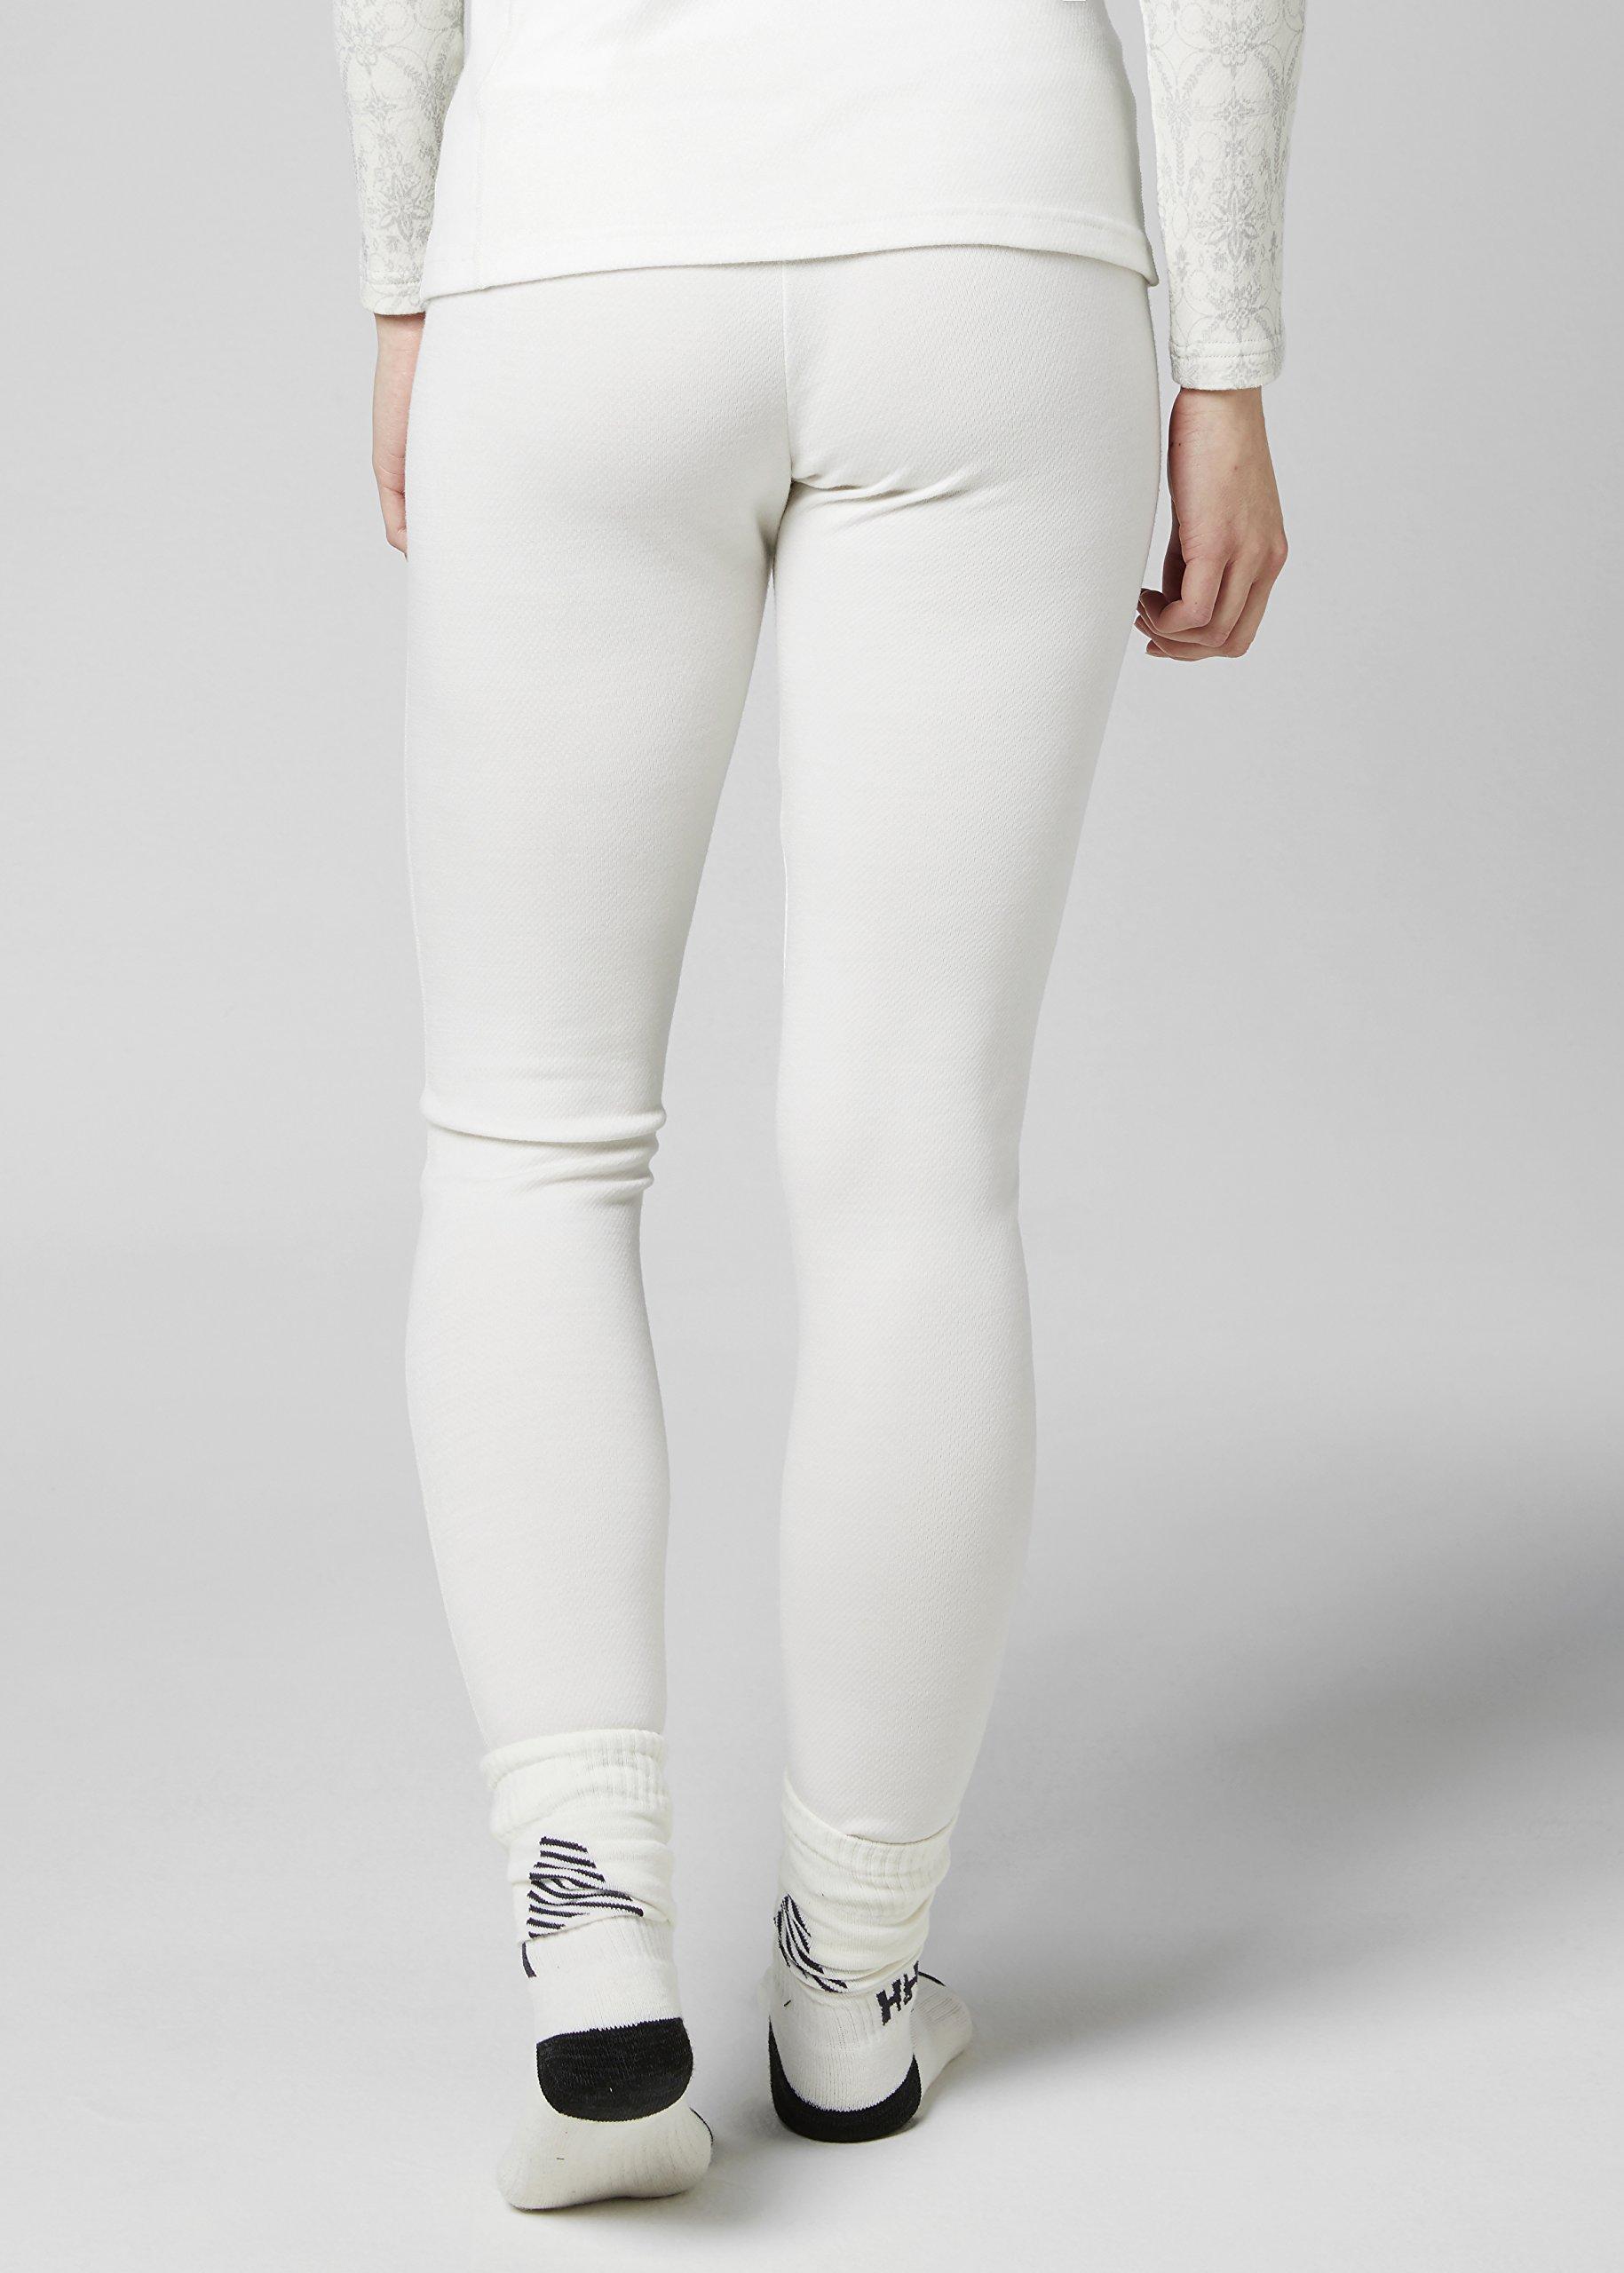 Helly Hansen Women's Hh Lifa Merino Basleayer Pants